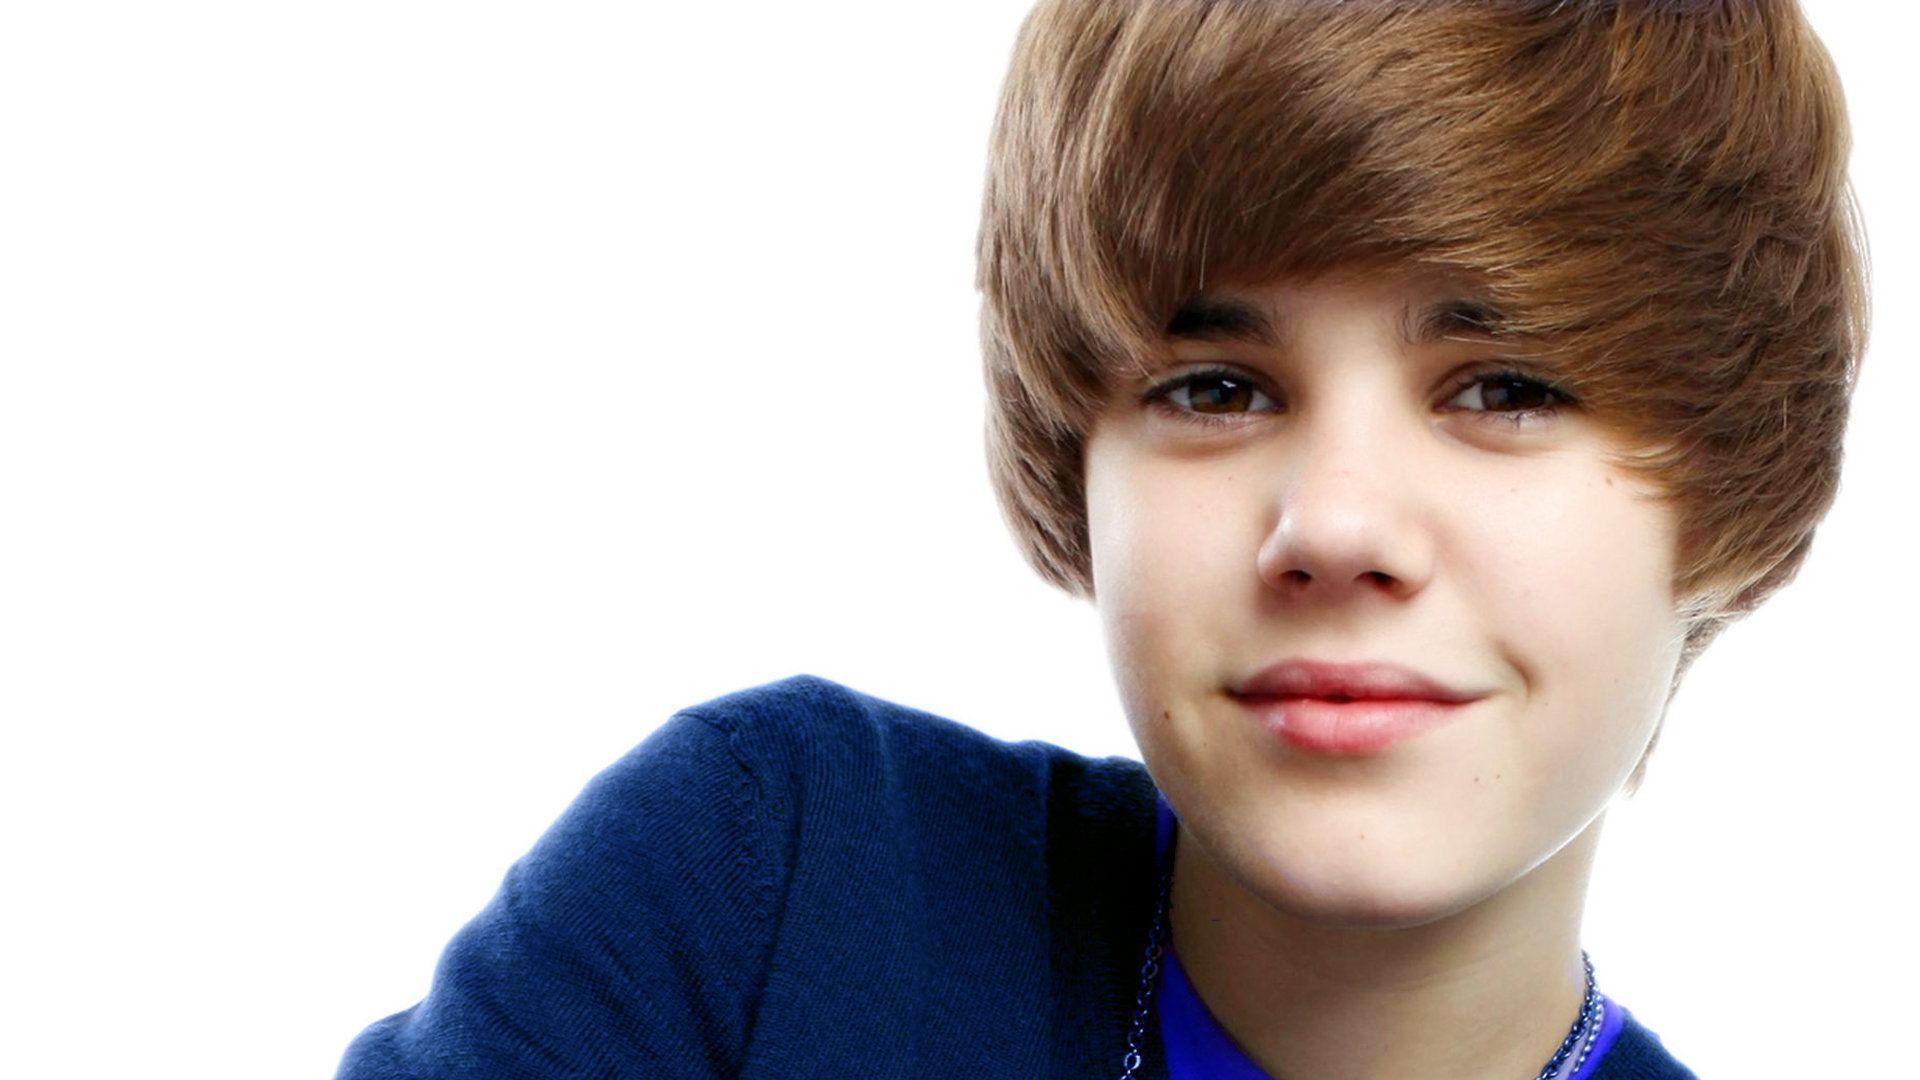 Justin Bieber HD Wallpapers - Wallpaper Cave